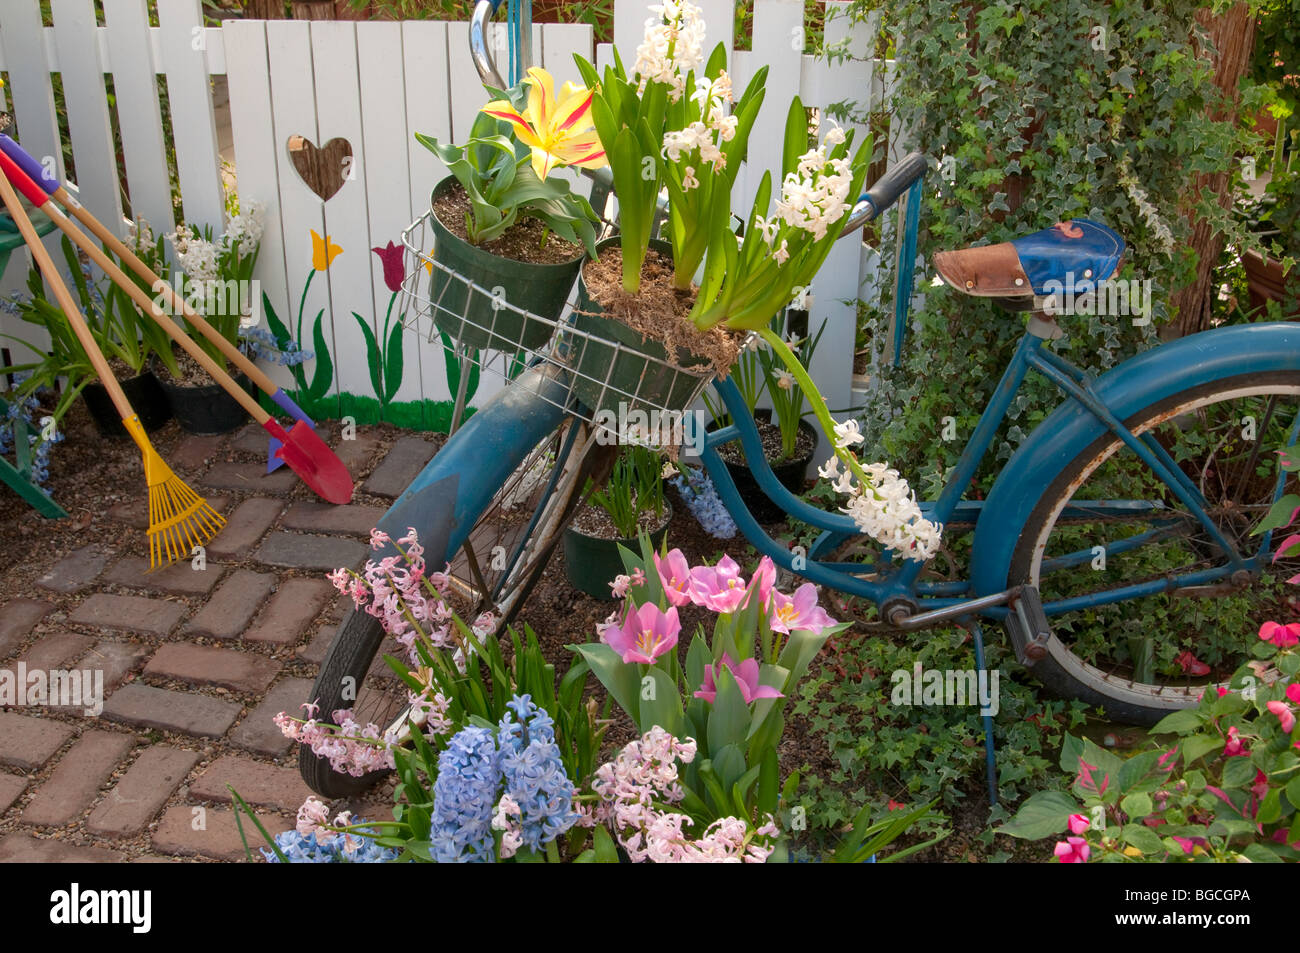 Bicycle near garden gate - Stock Image